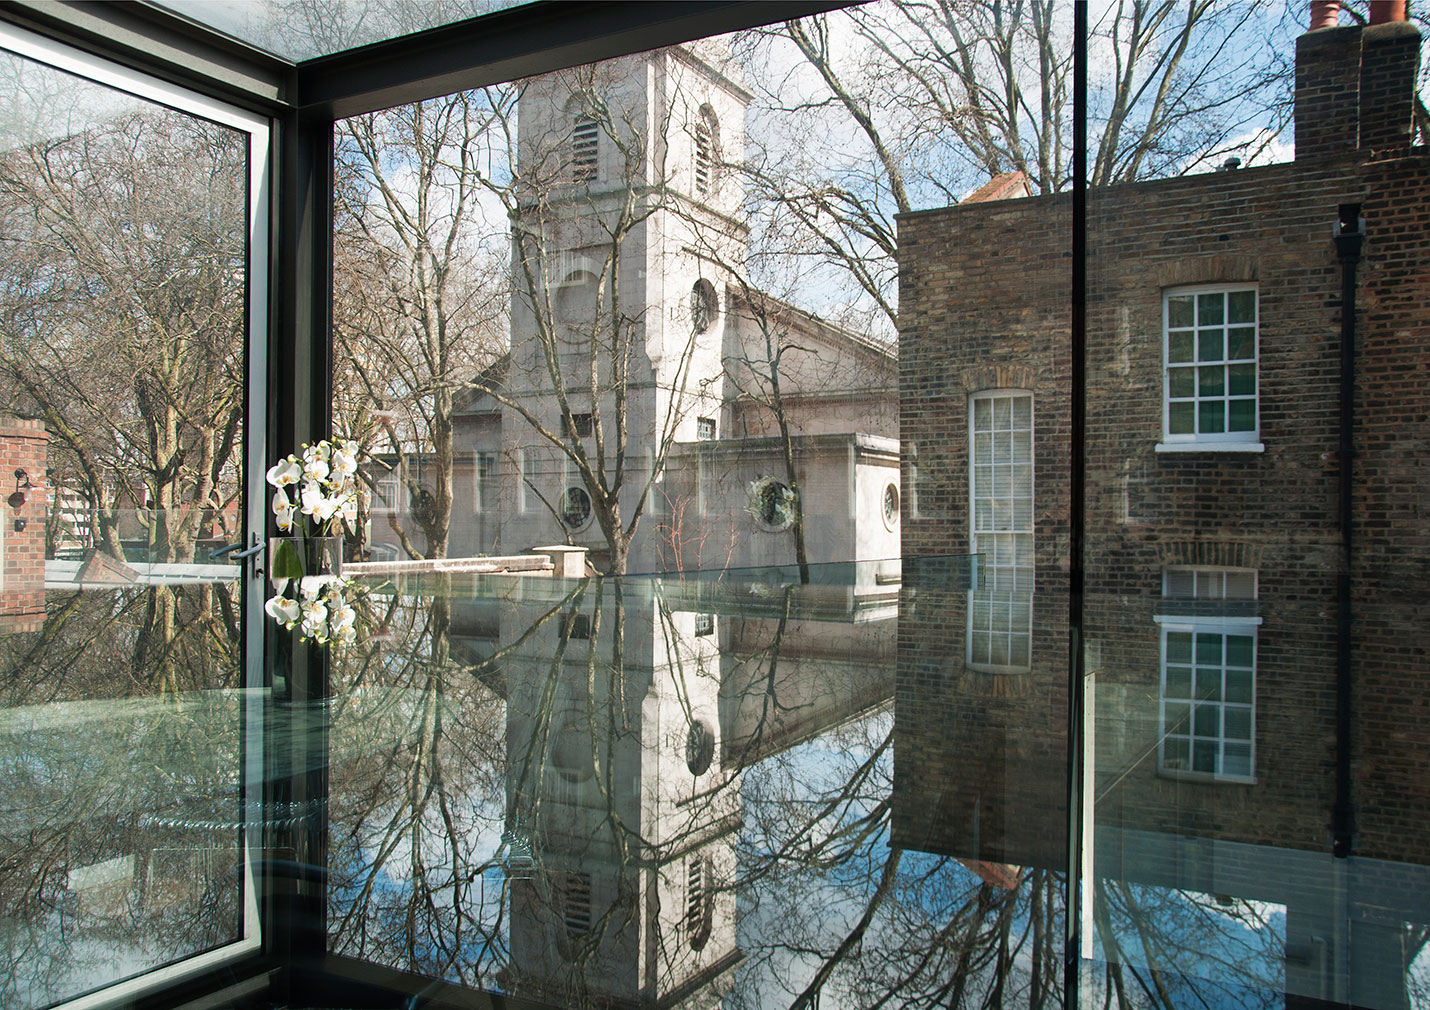 Marta Nowicka's warehouse home in Clerkenwell